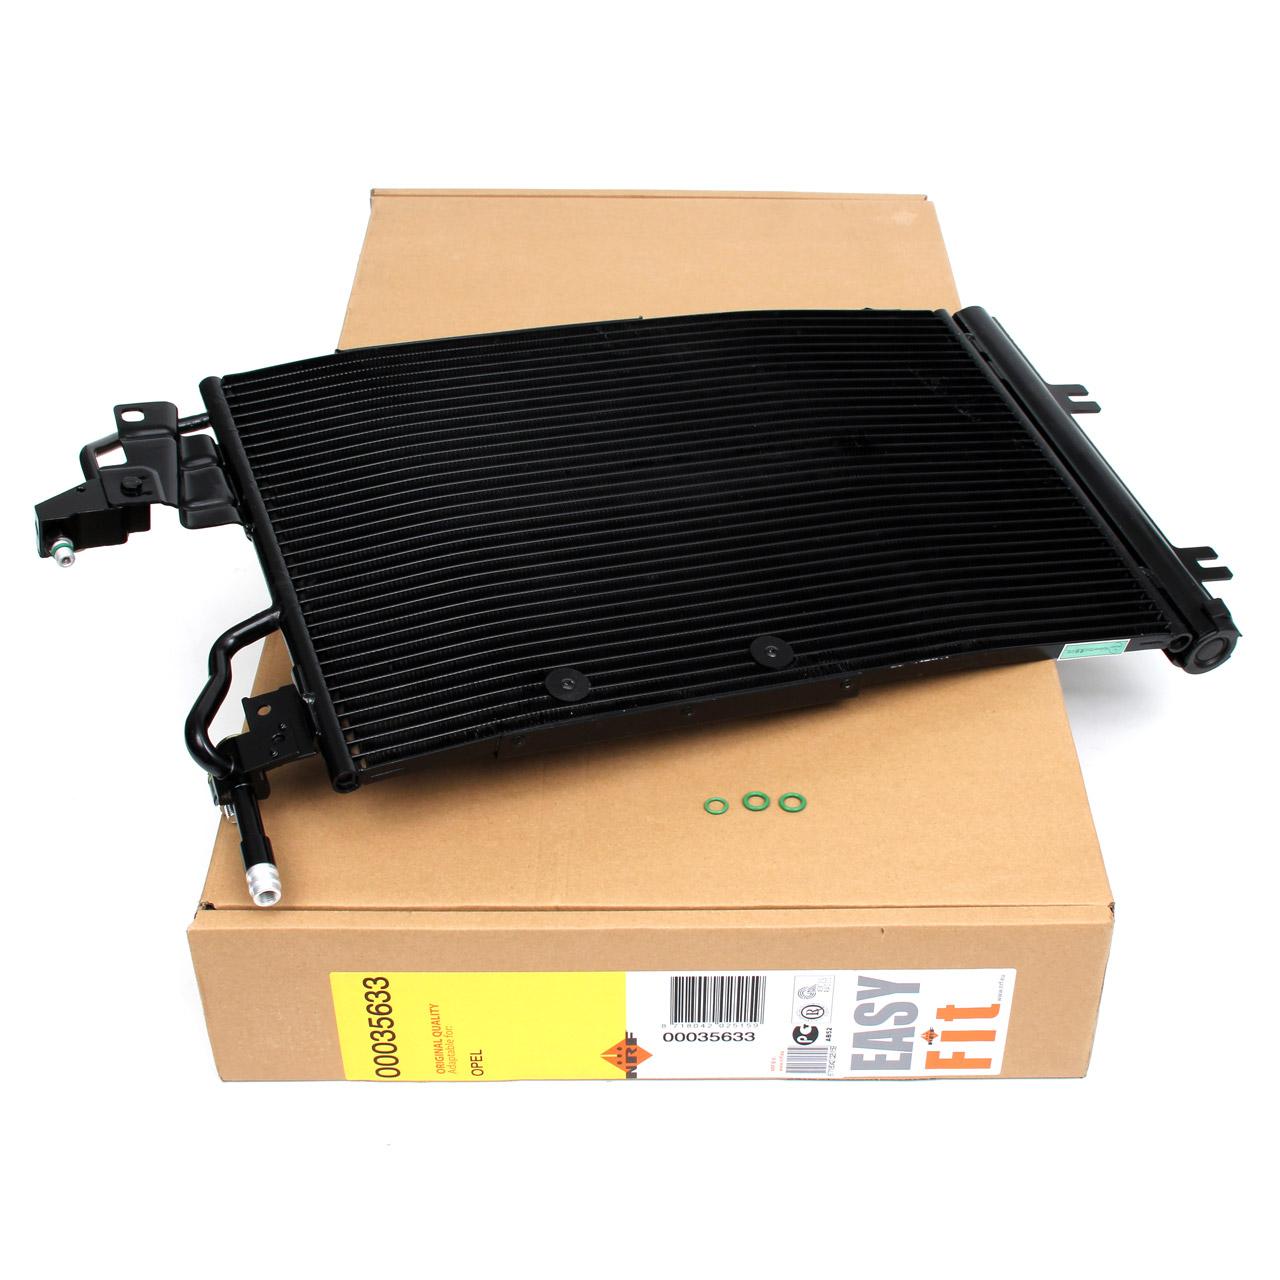 NRF 35633 Kondensator Klimakondensator EASY FIT OPEL Astra H A04 L70 Zafira B A05 13171592